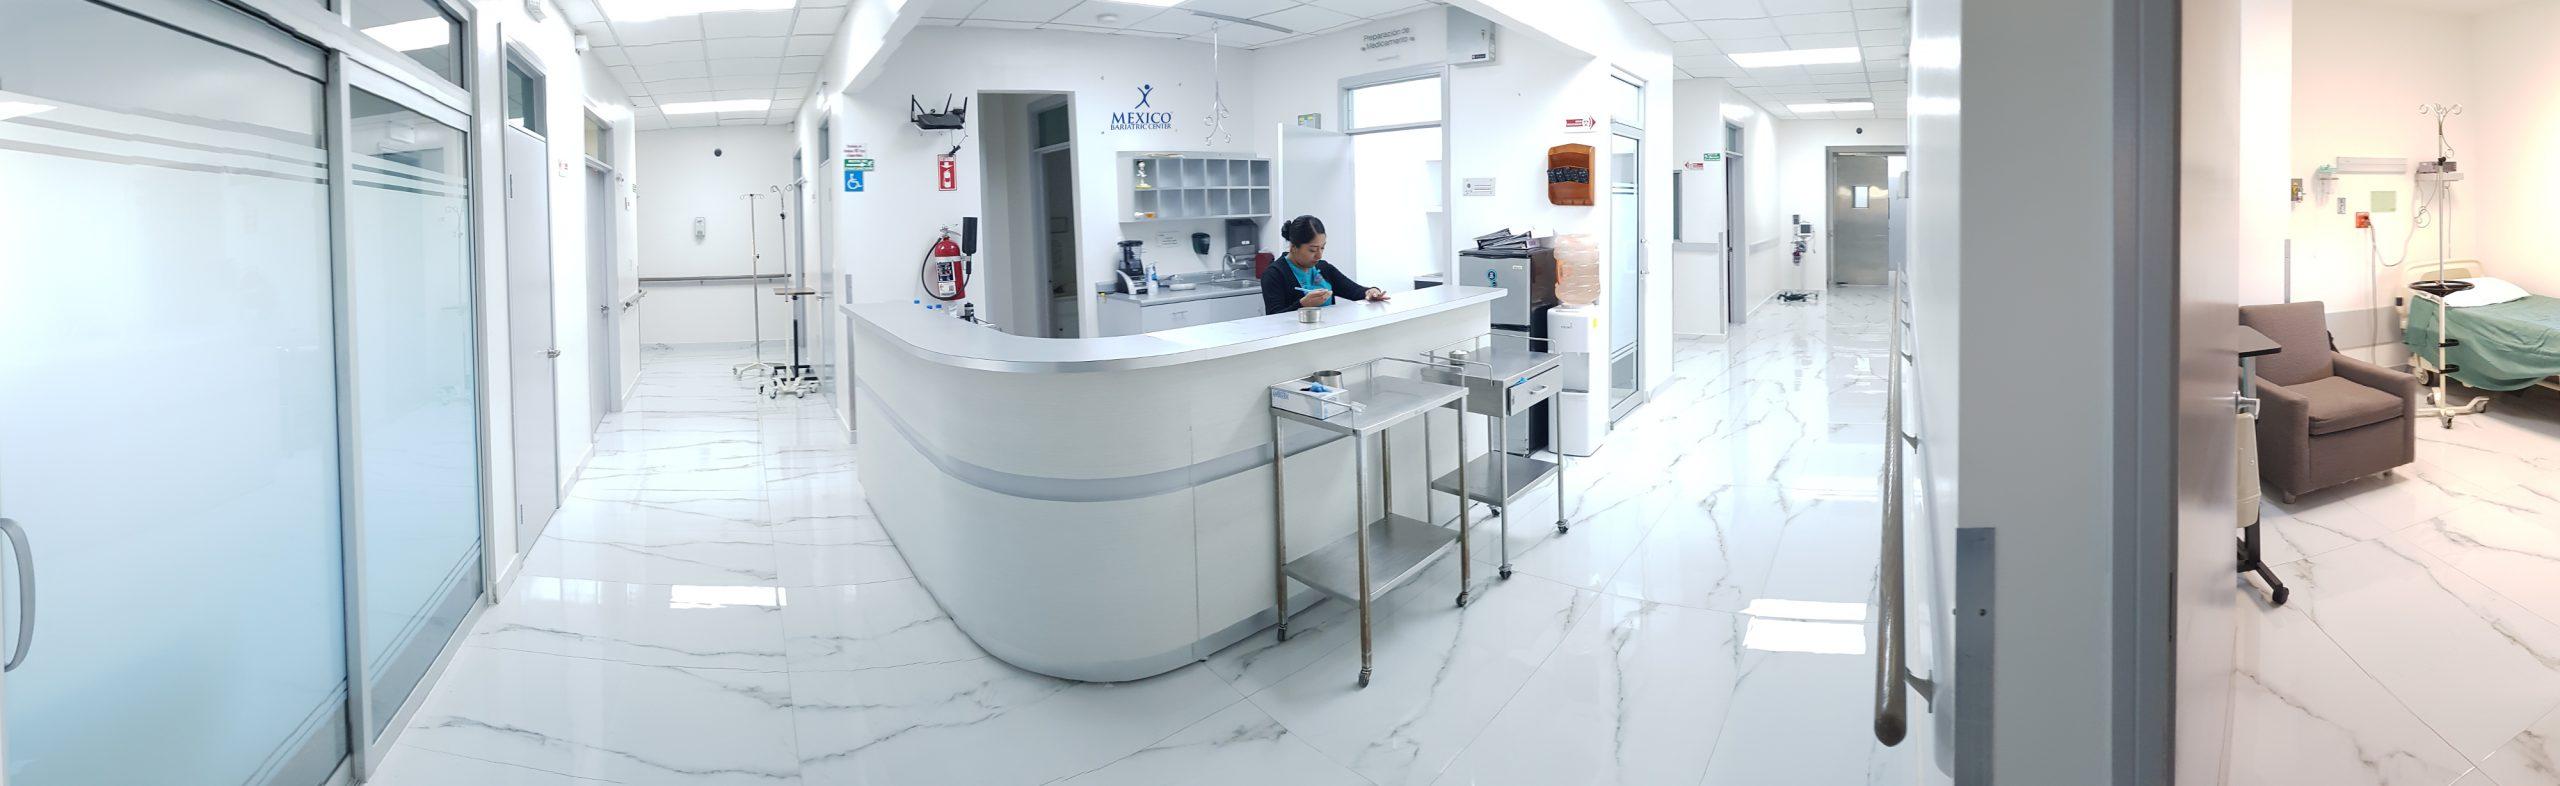 Hospital Mi Doctor Nurse Station - Mexico Bariatric Center